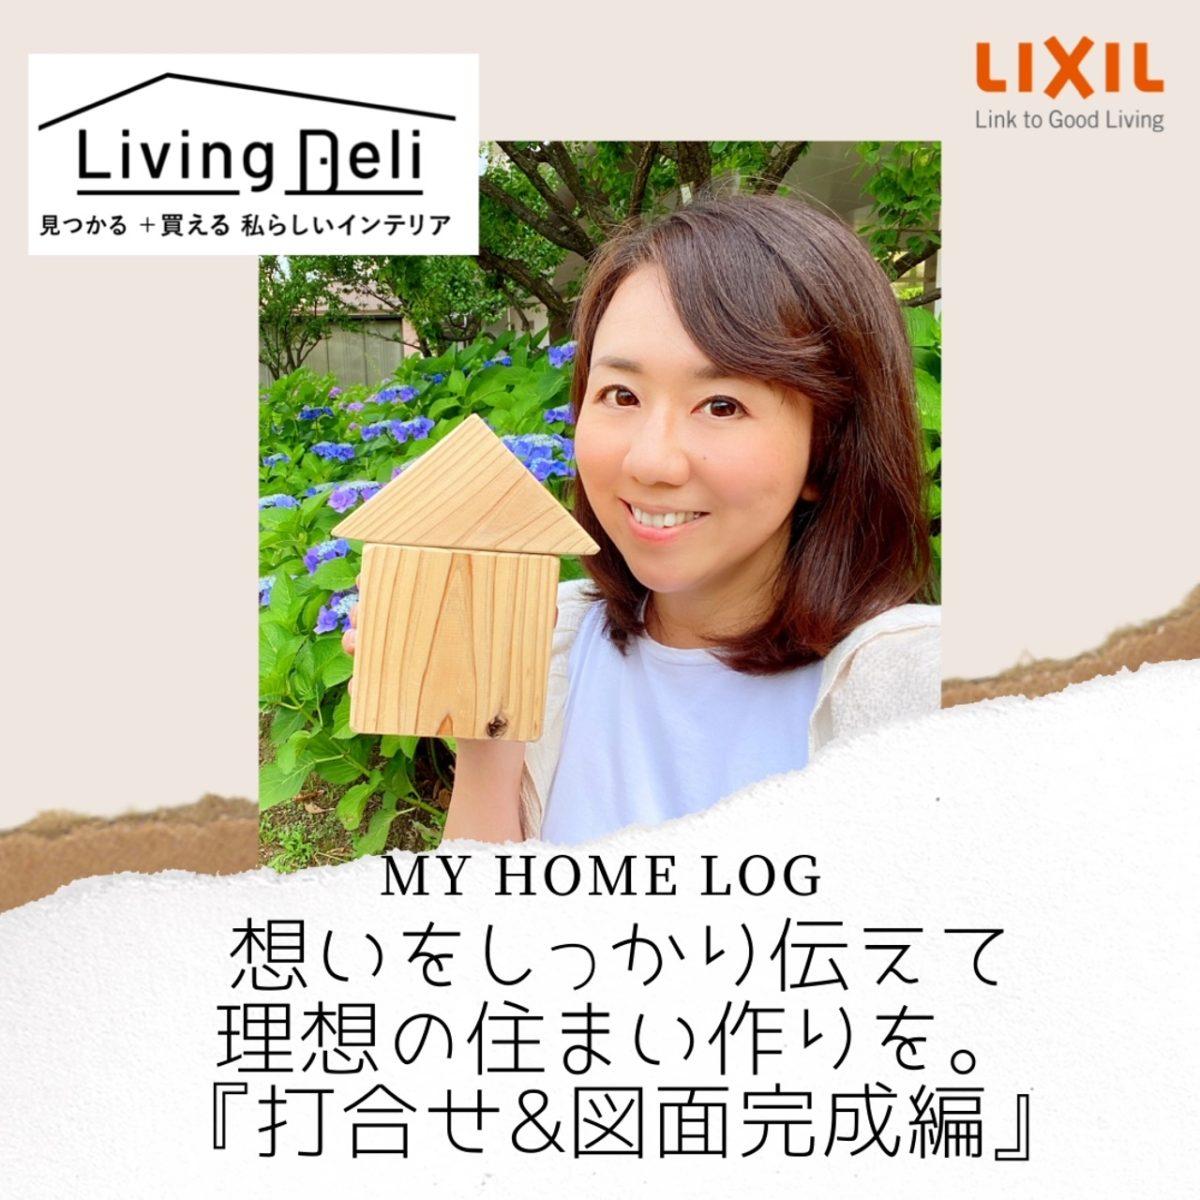 【Lixil Living Deliアンバサダー】想いをしっかり伝えて理想の住まい作りを。打合せ&図面完成編